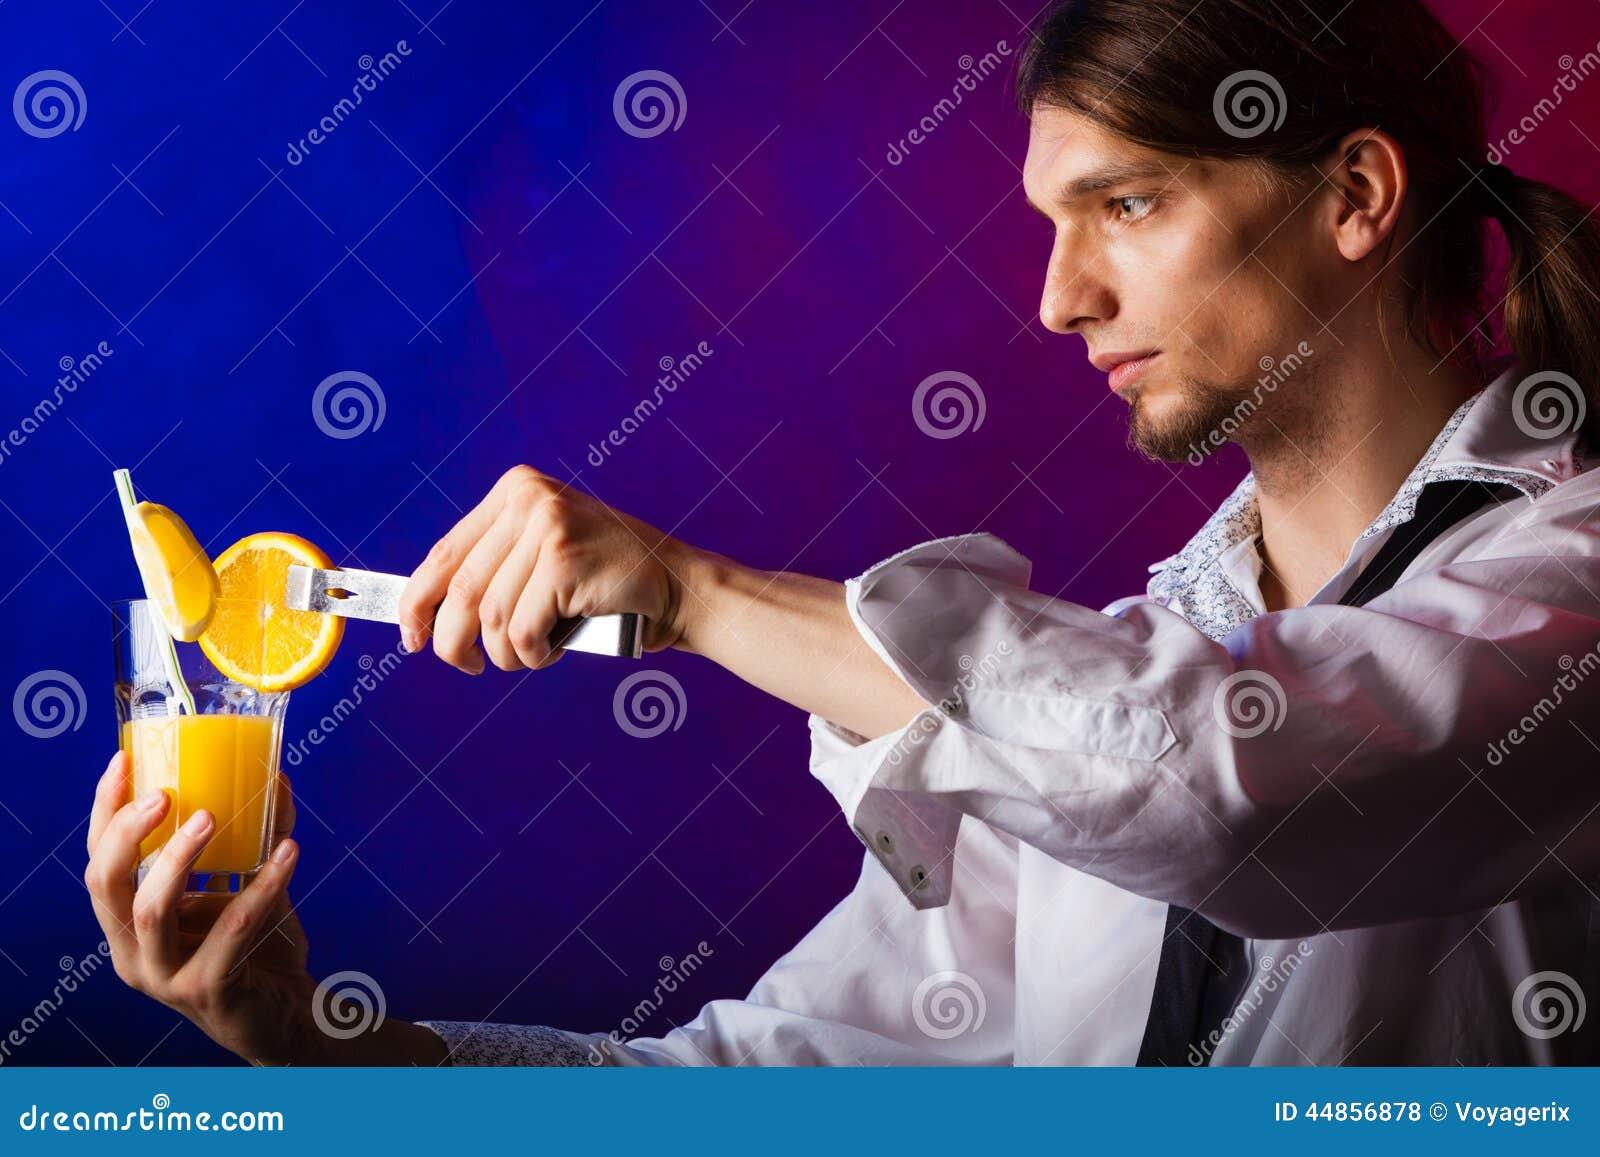 Camarero del hombre joven que prepara la bebida del cóctel del alcohol